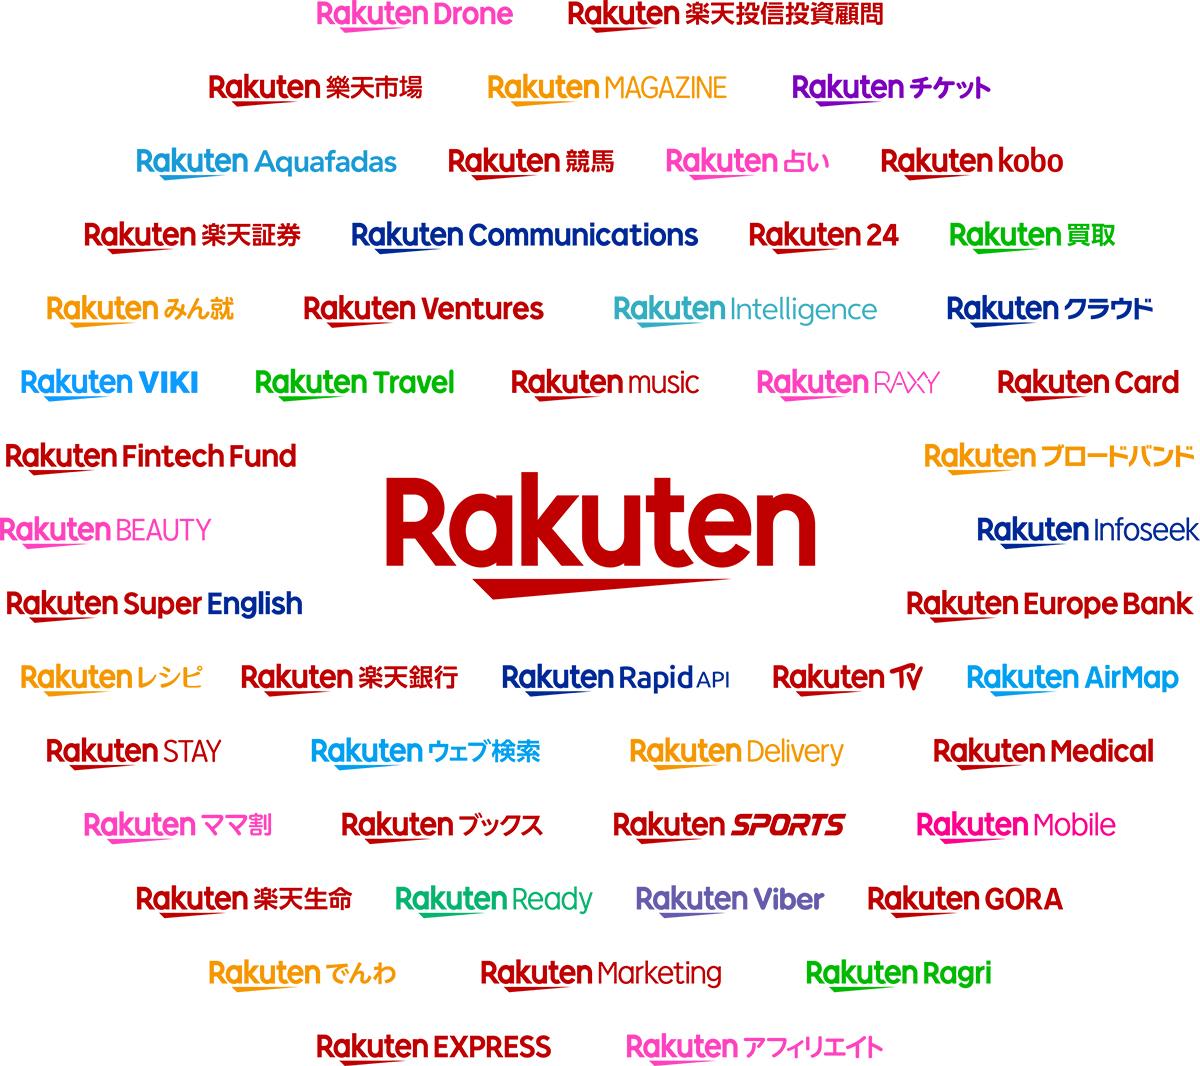 takejuneさんのツイート画像